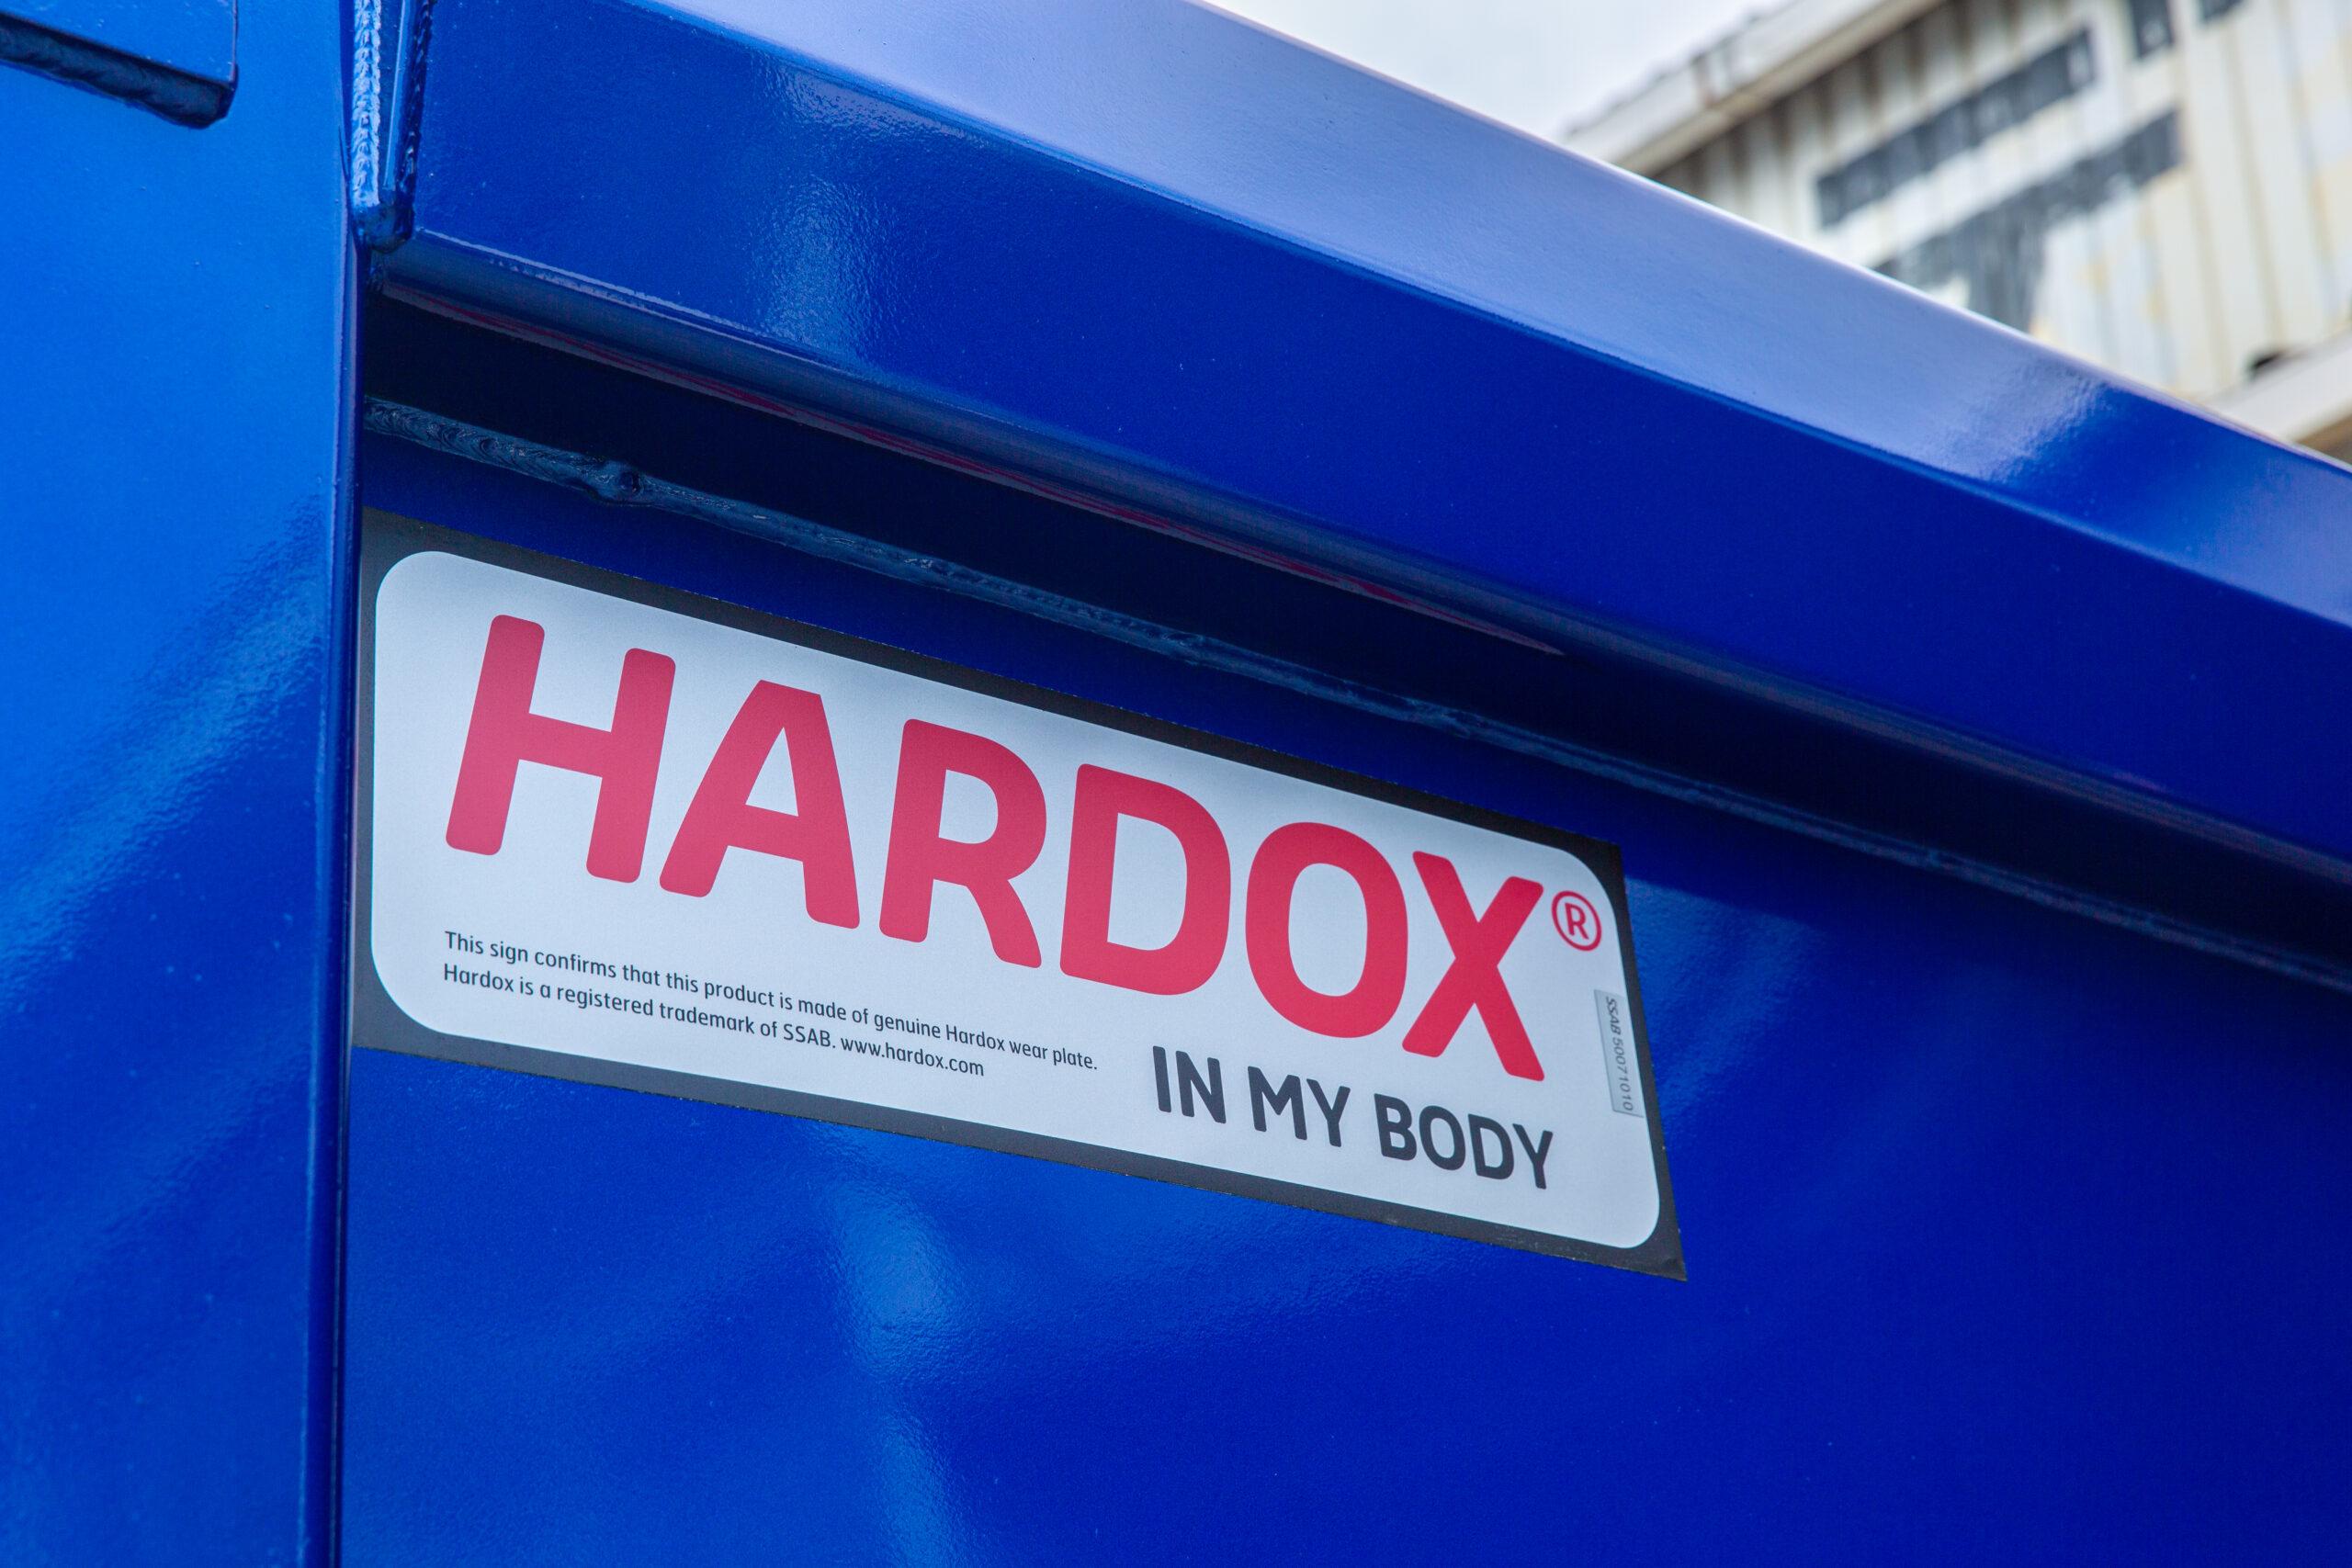 HARDOX IN MY BODYのシール